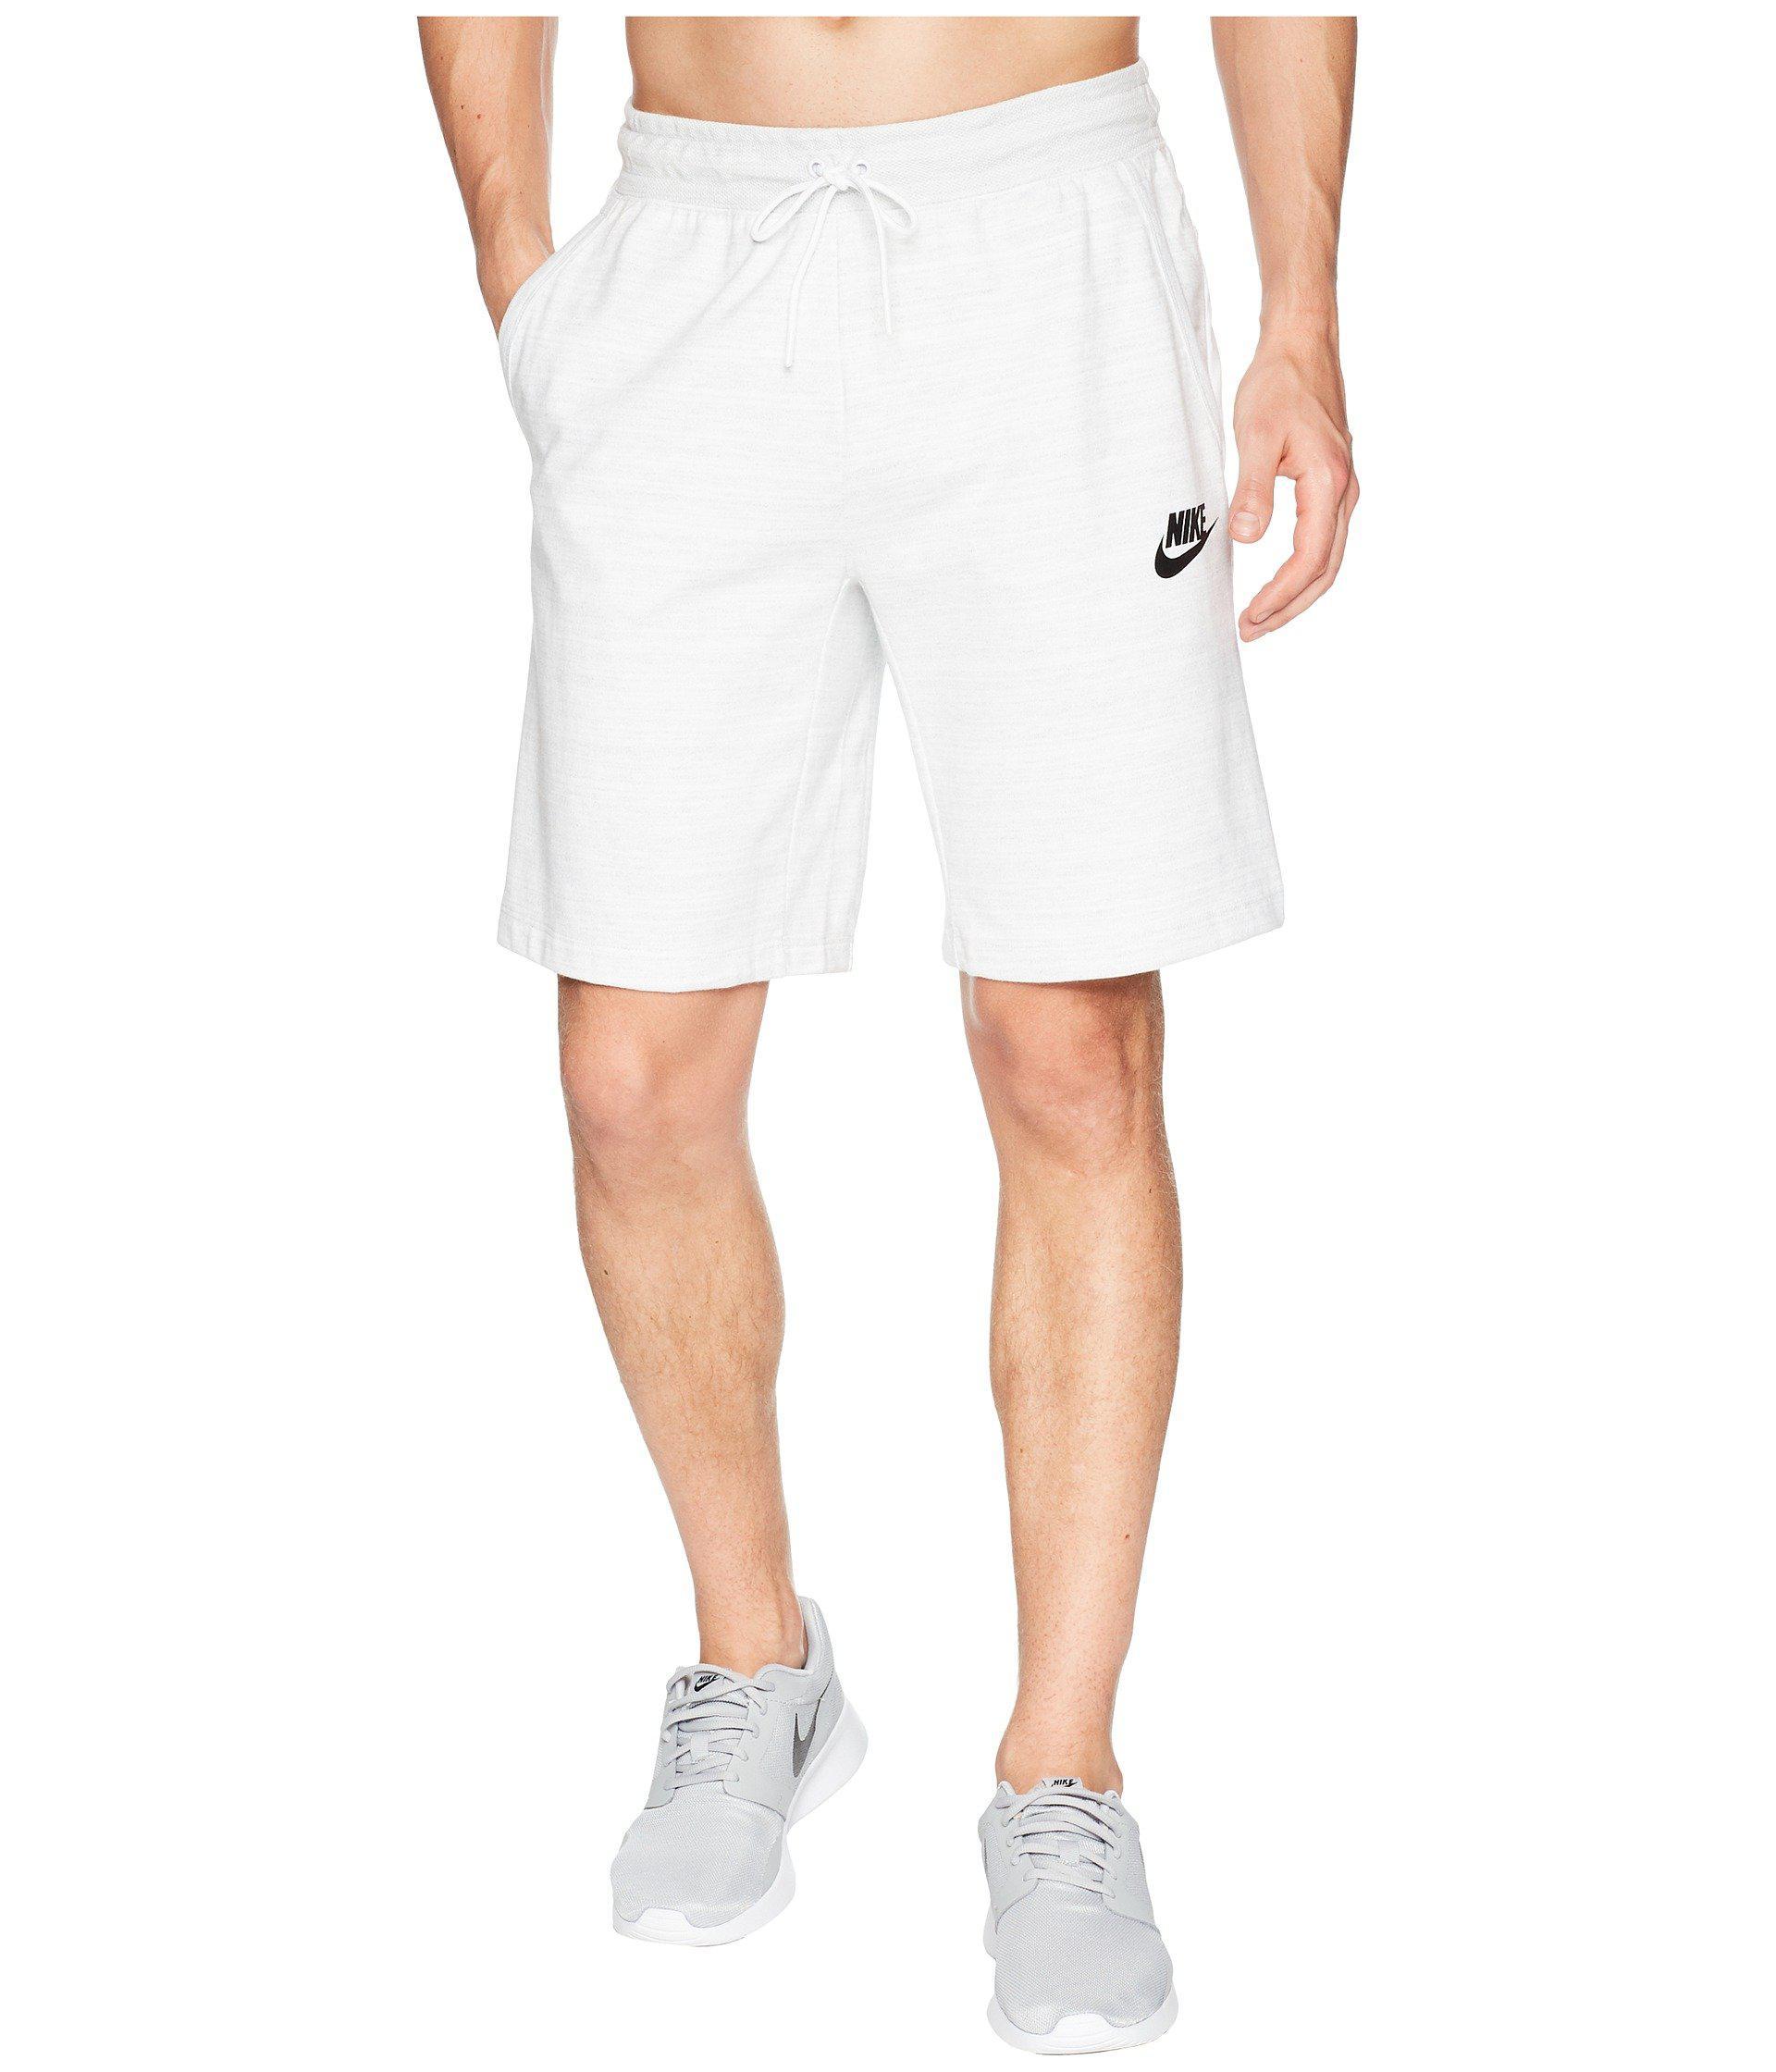 04de897a5fa Nike Nsw Av15 Shorts Knit (white/heather/white/black) Shorts for men